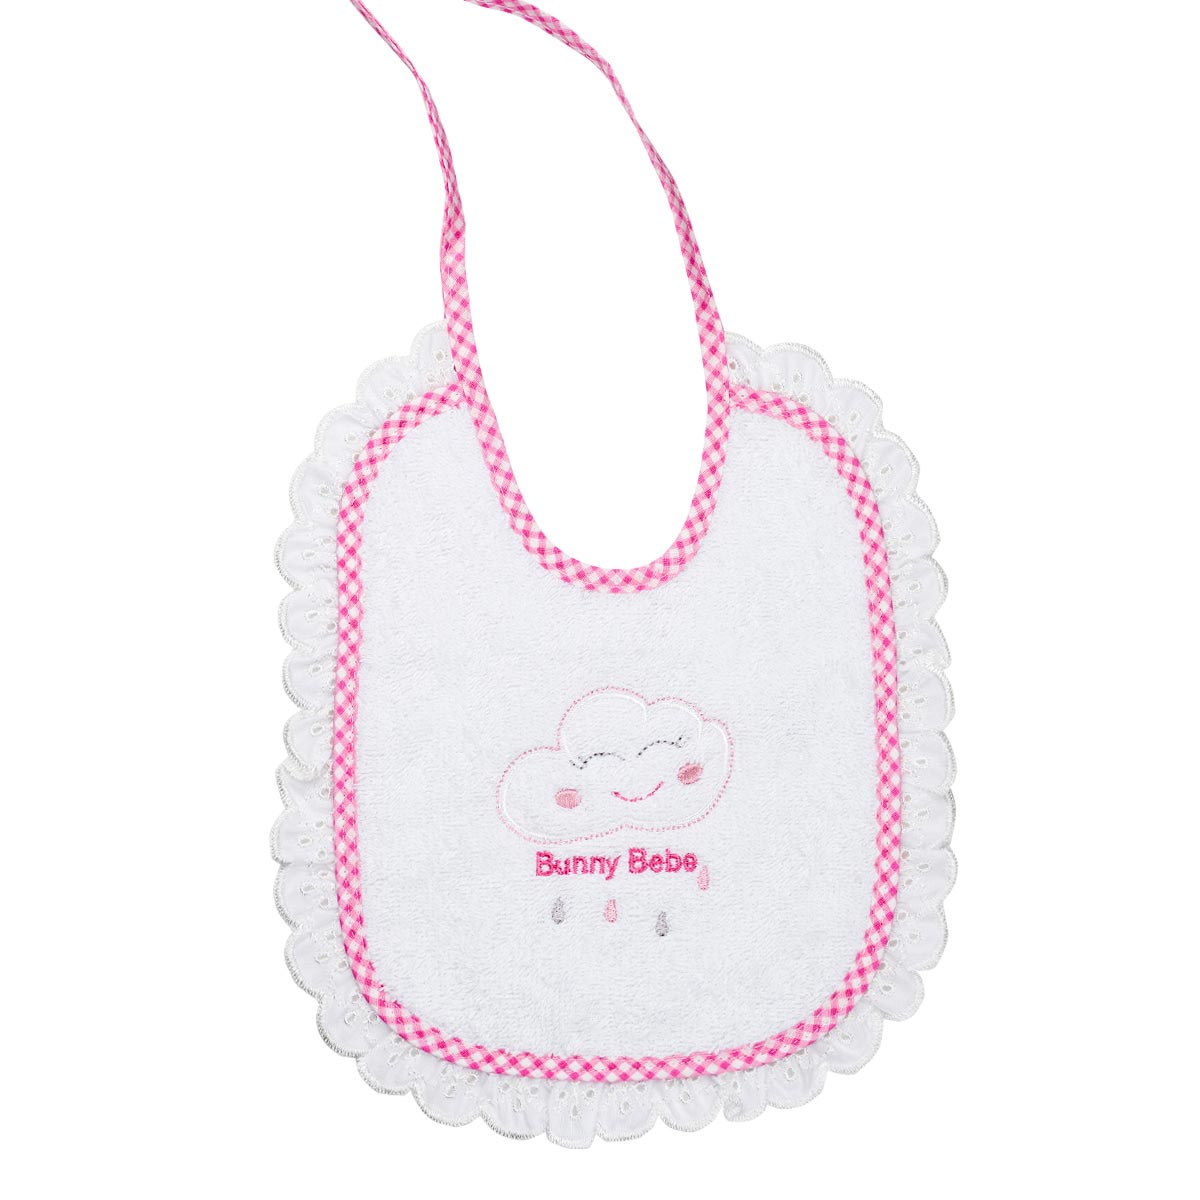 Bunny bebe σαλιάρα πετσετέ με ρέλι και δαντέλα συννεφάκι ροζ